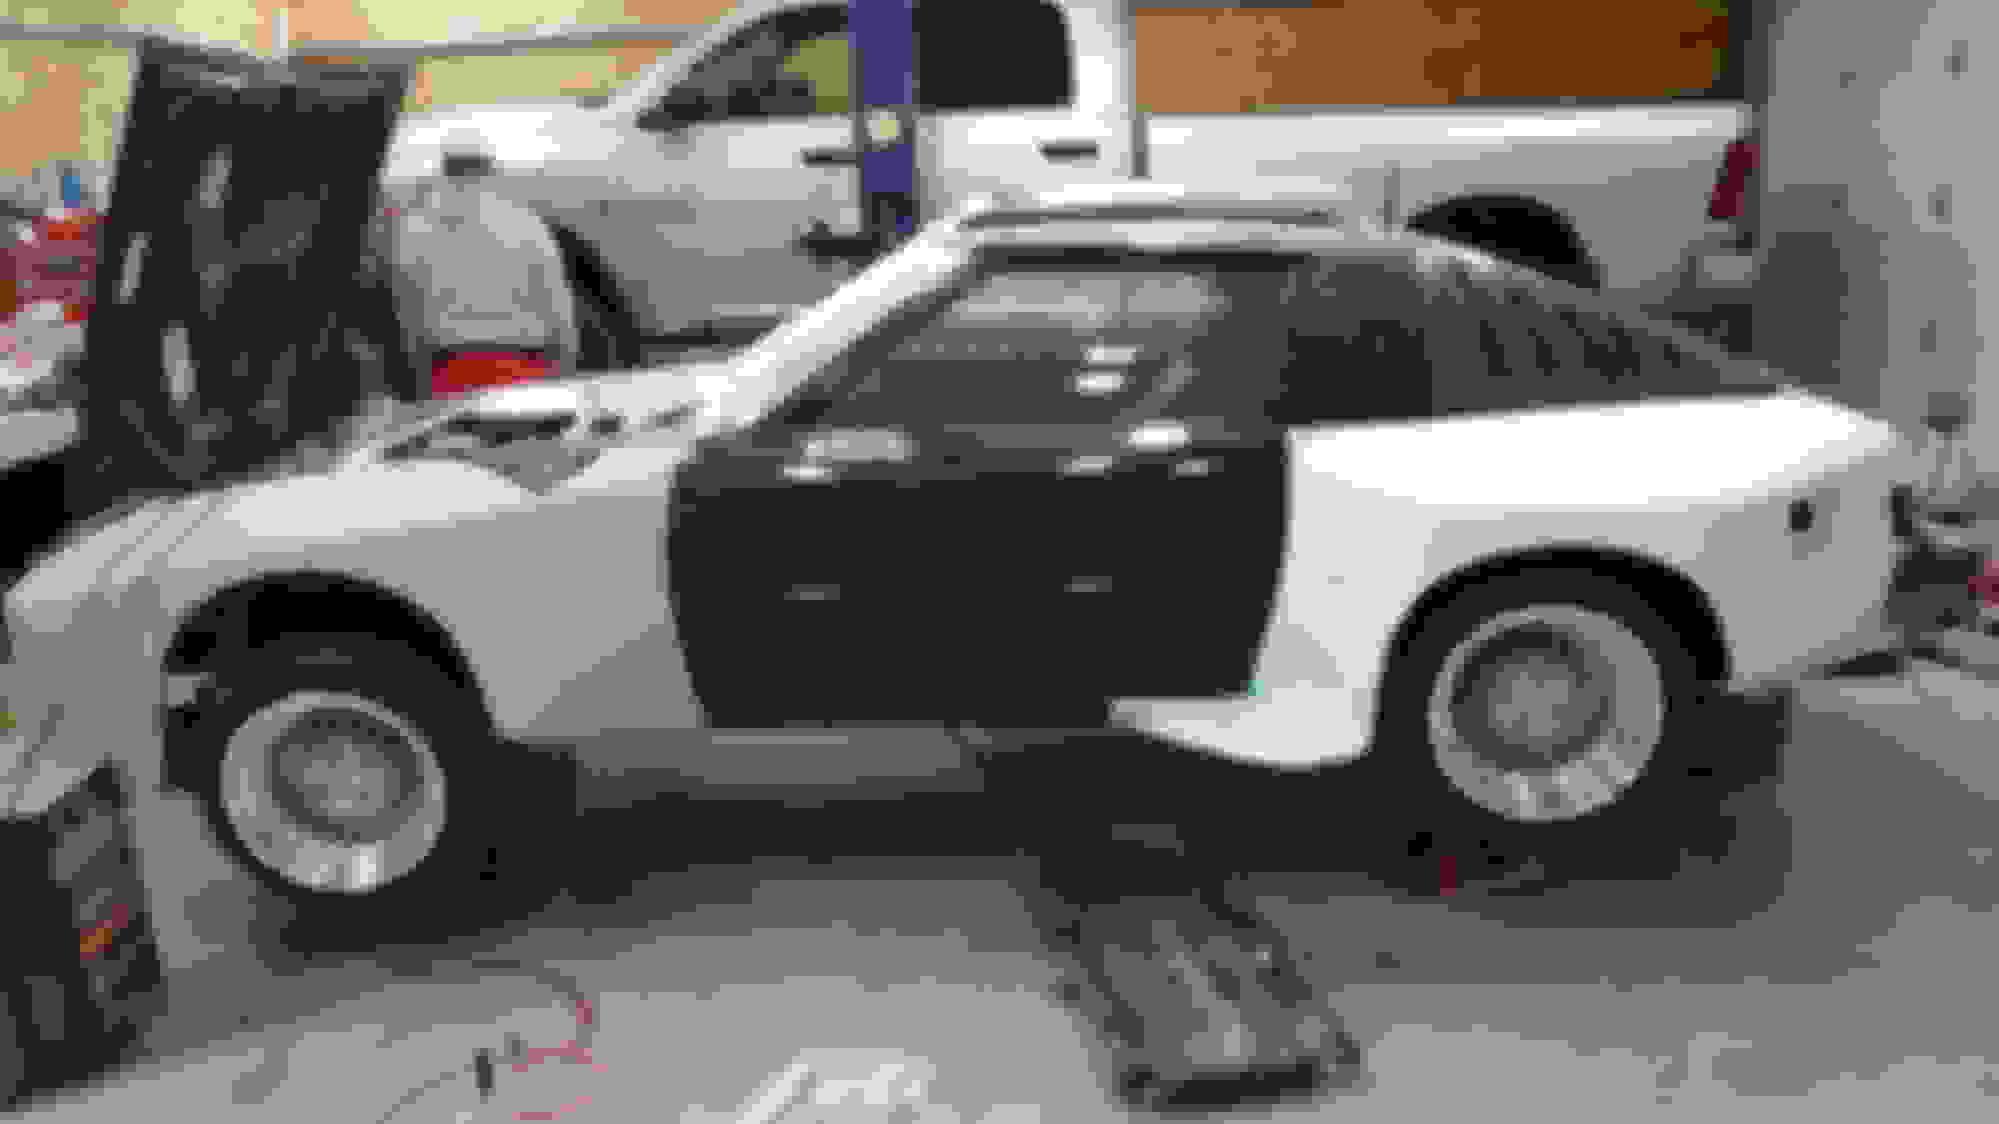 t3 vs t4 volute a/r sizing - RX7Club com - Mazda RX7 Forum